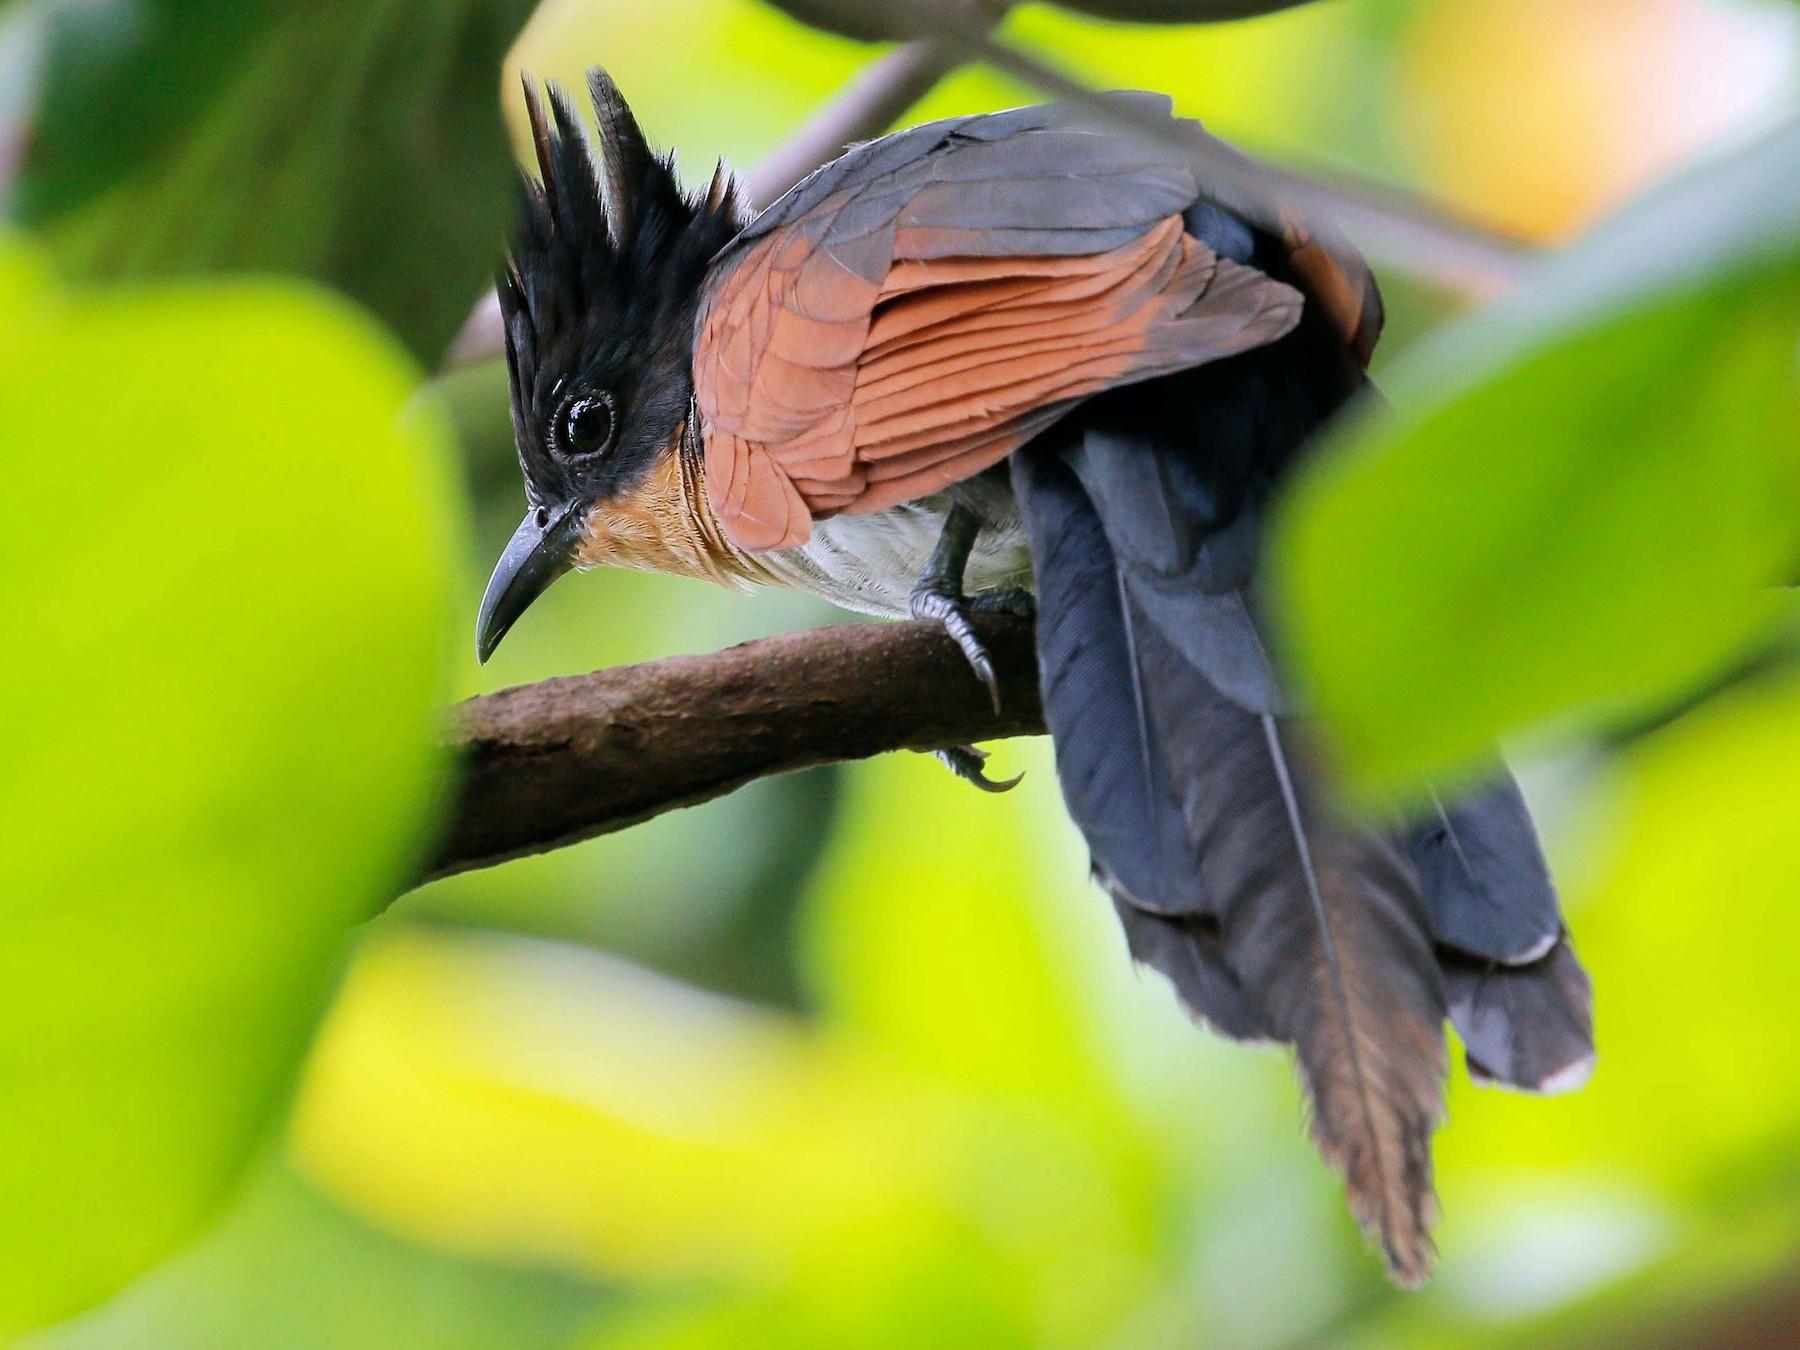 Chestnut-winged Cuckoo - Neoh Hor Kee